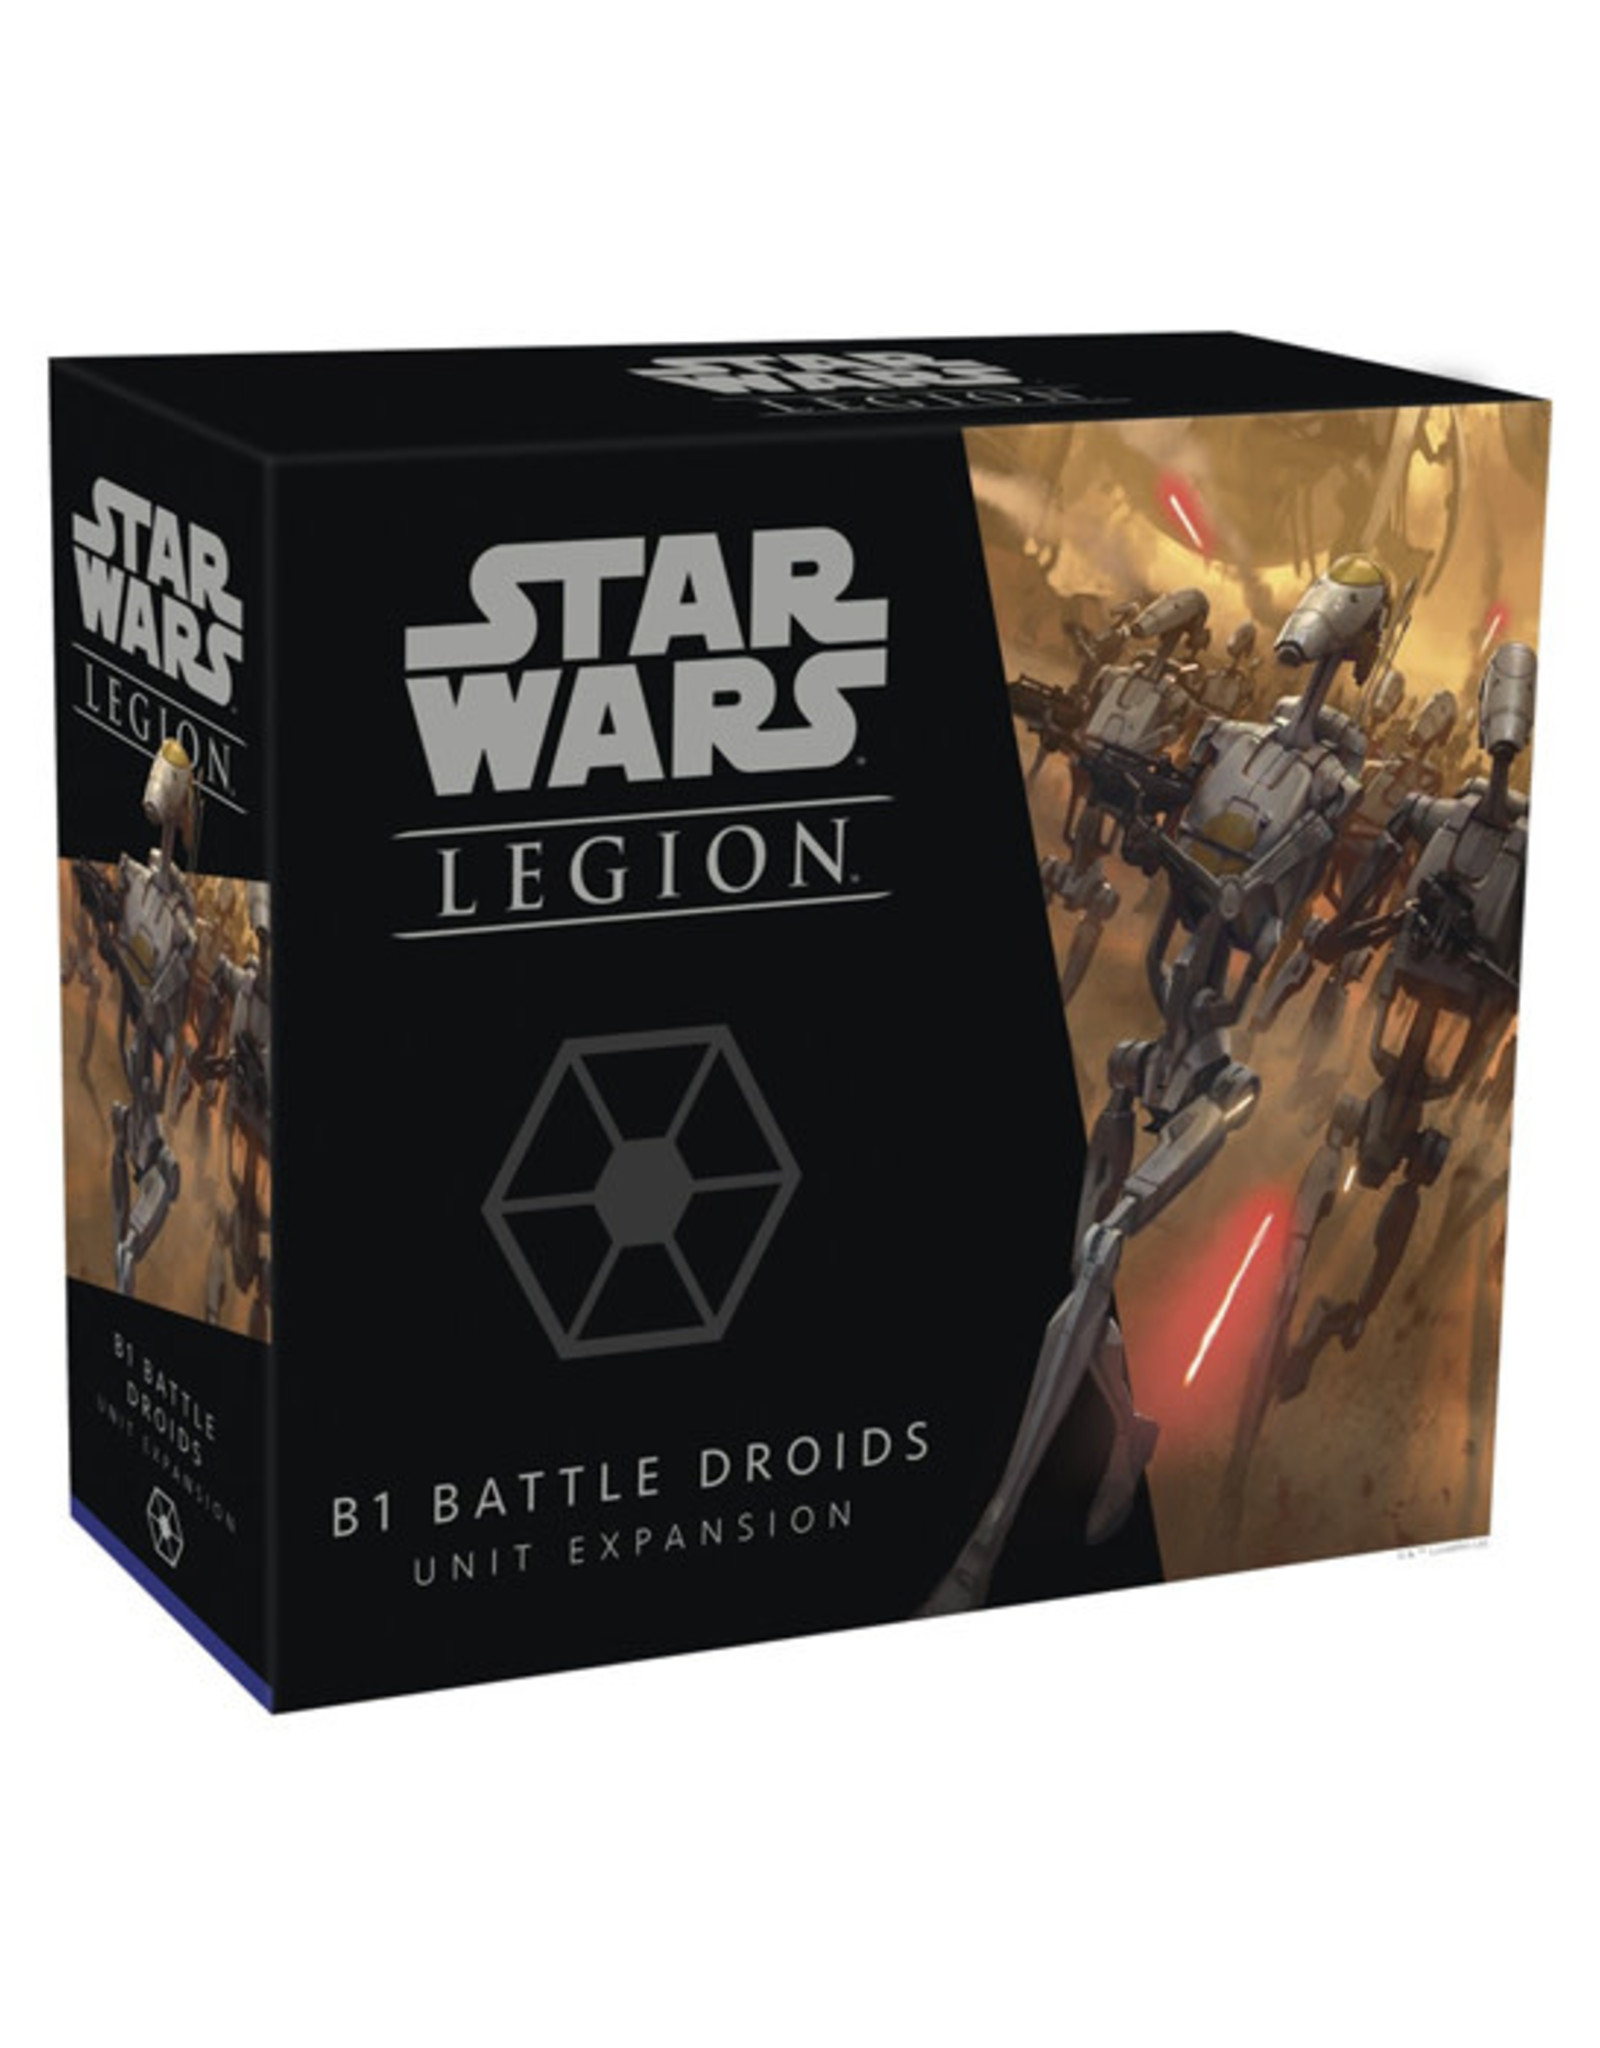 Fantasy Flight Games Star Wars: Legion - B1 Battle Droids